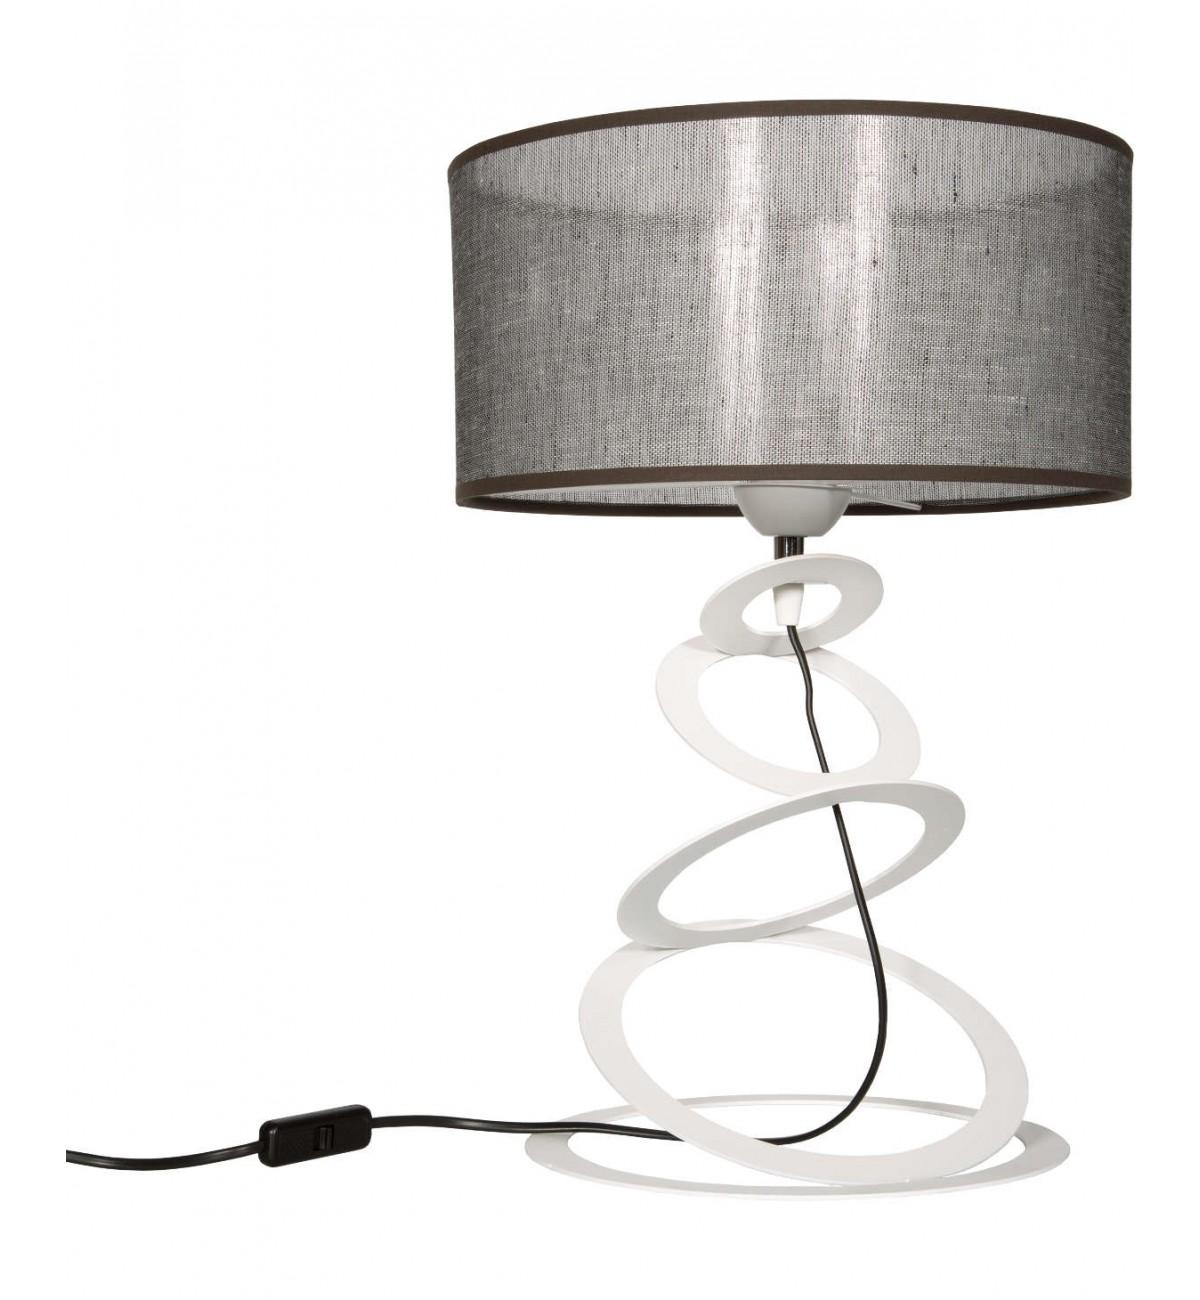 lampka nocna stojaca z abazurem